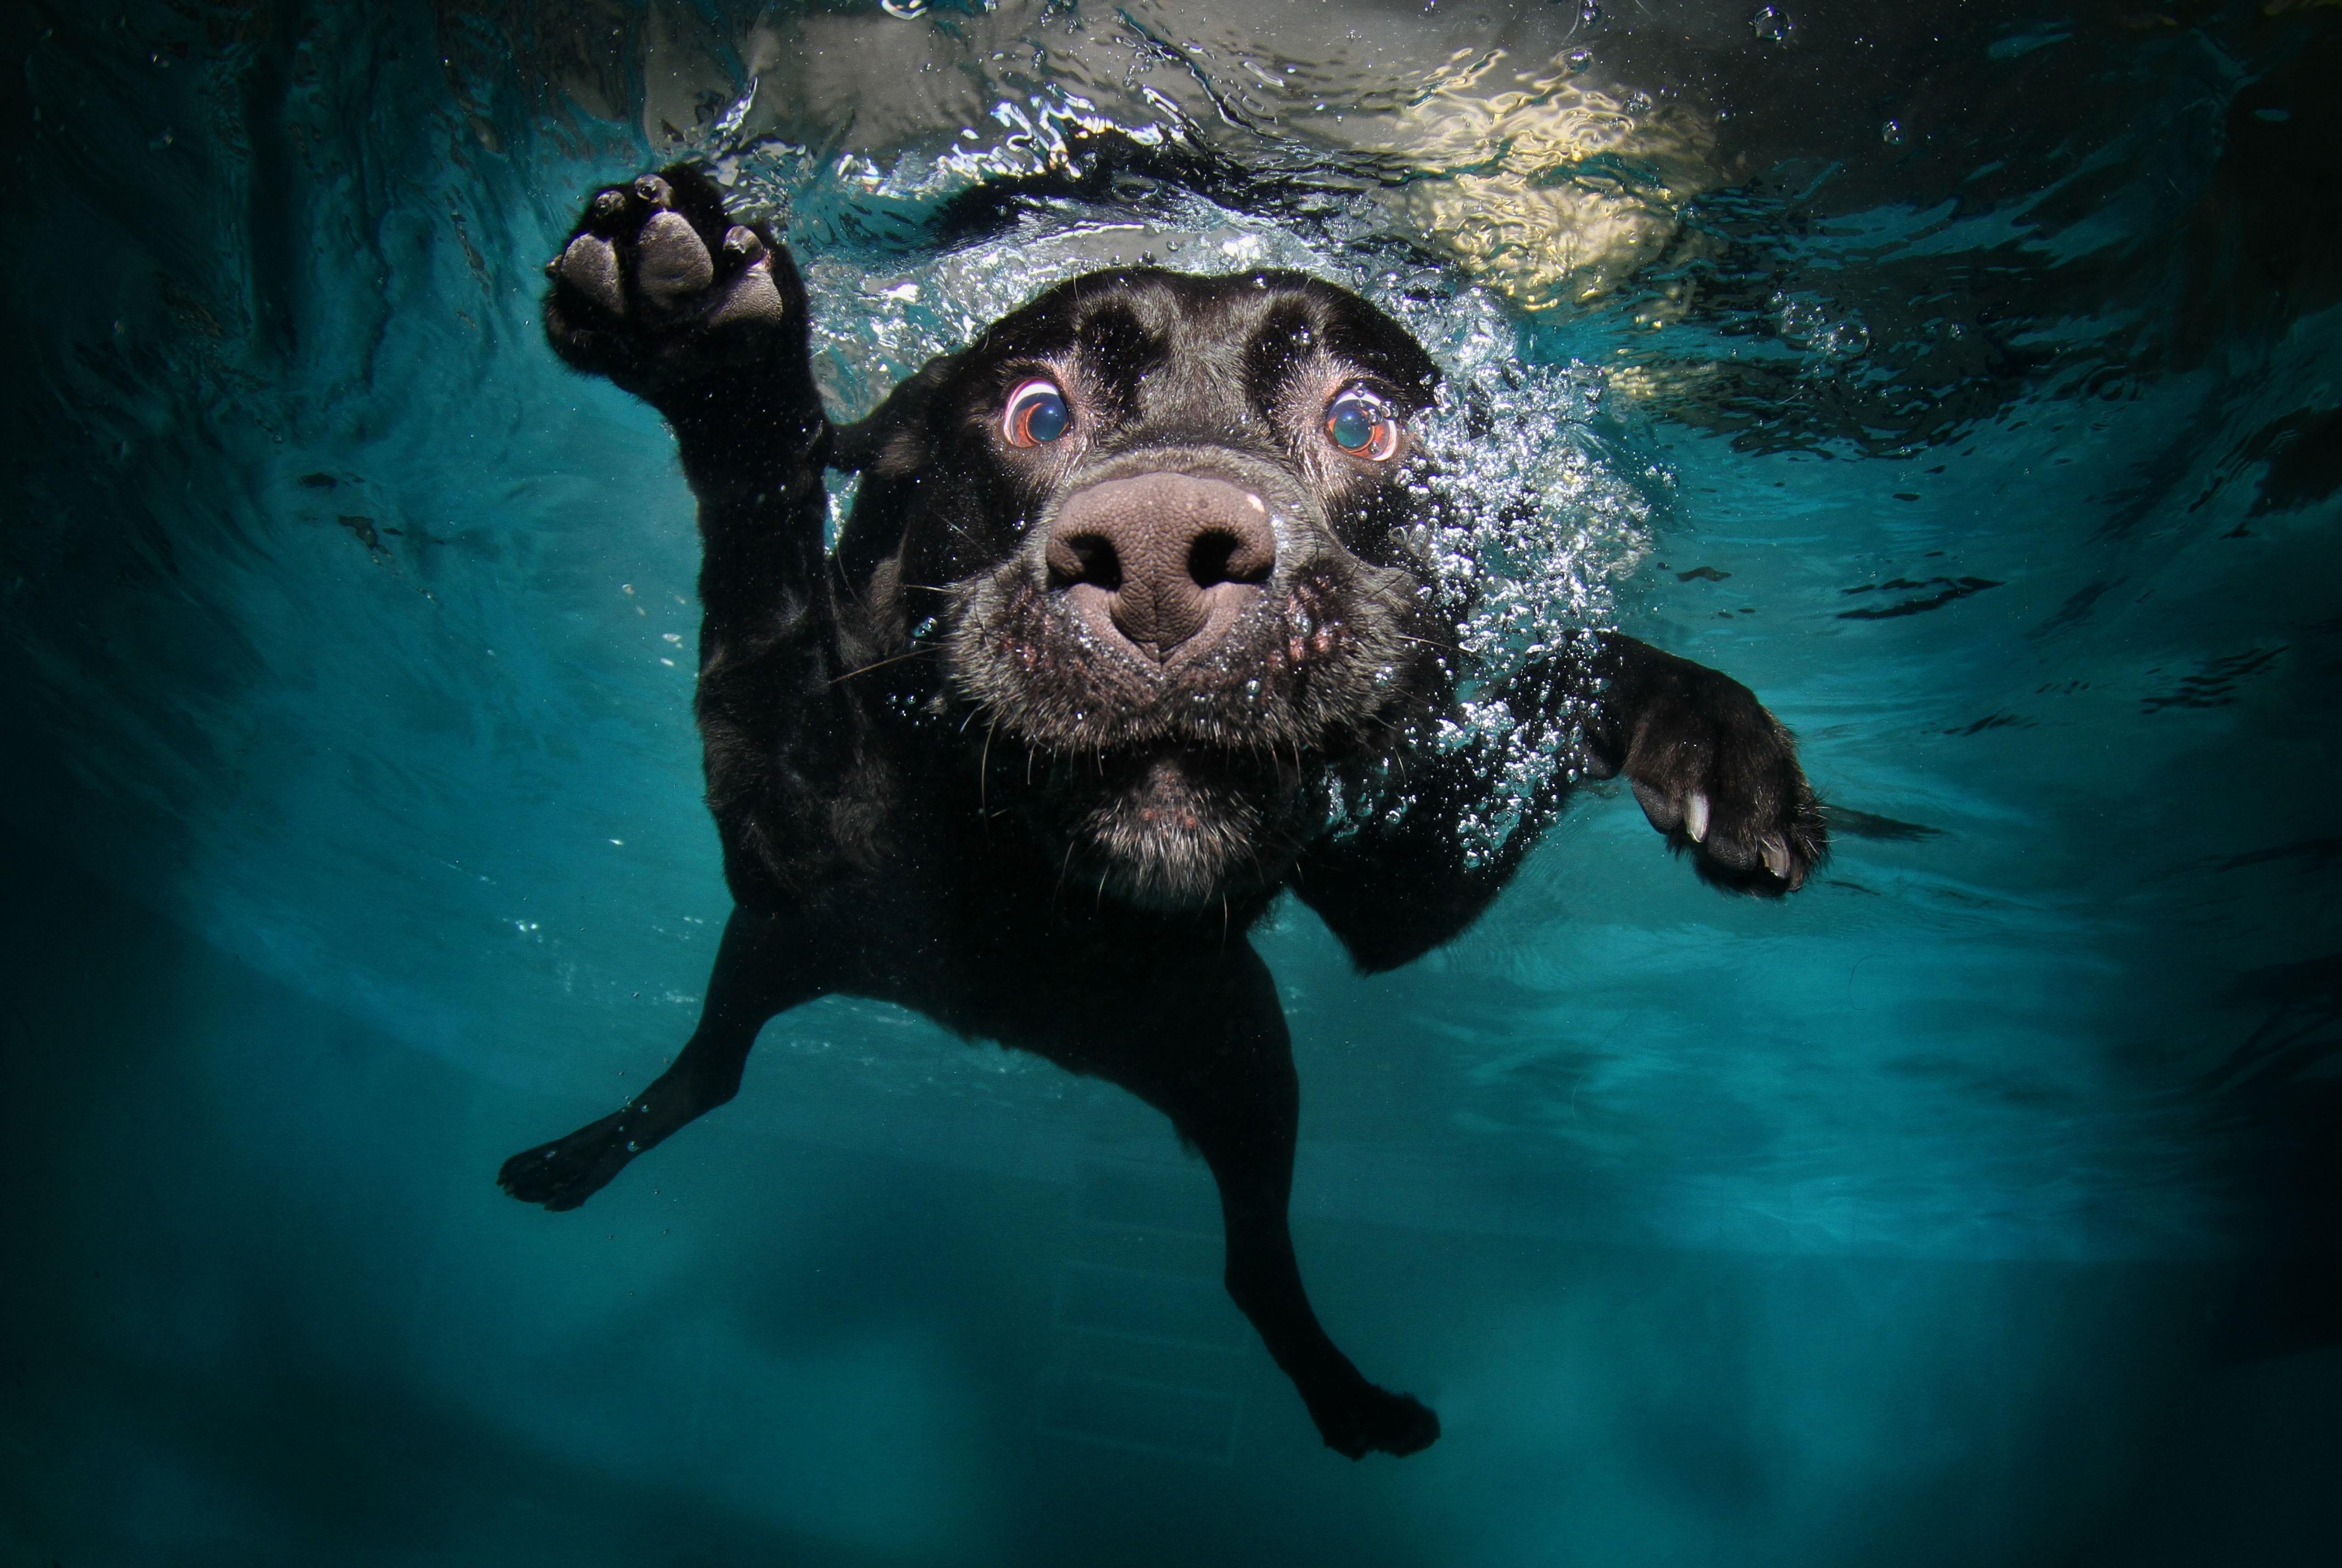 плавающий картинки для экрана все